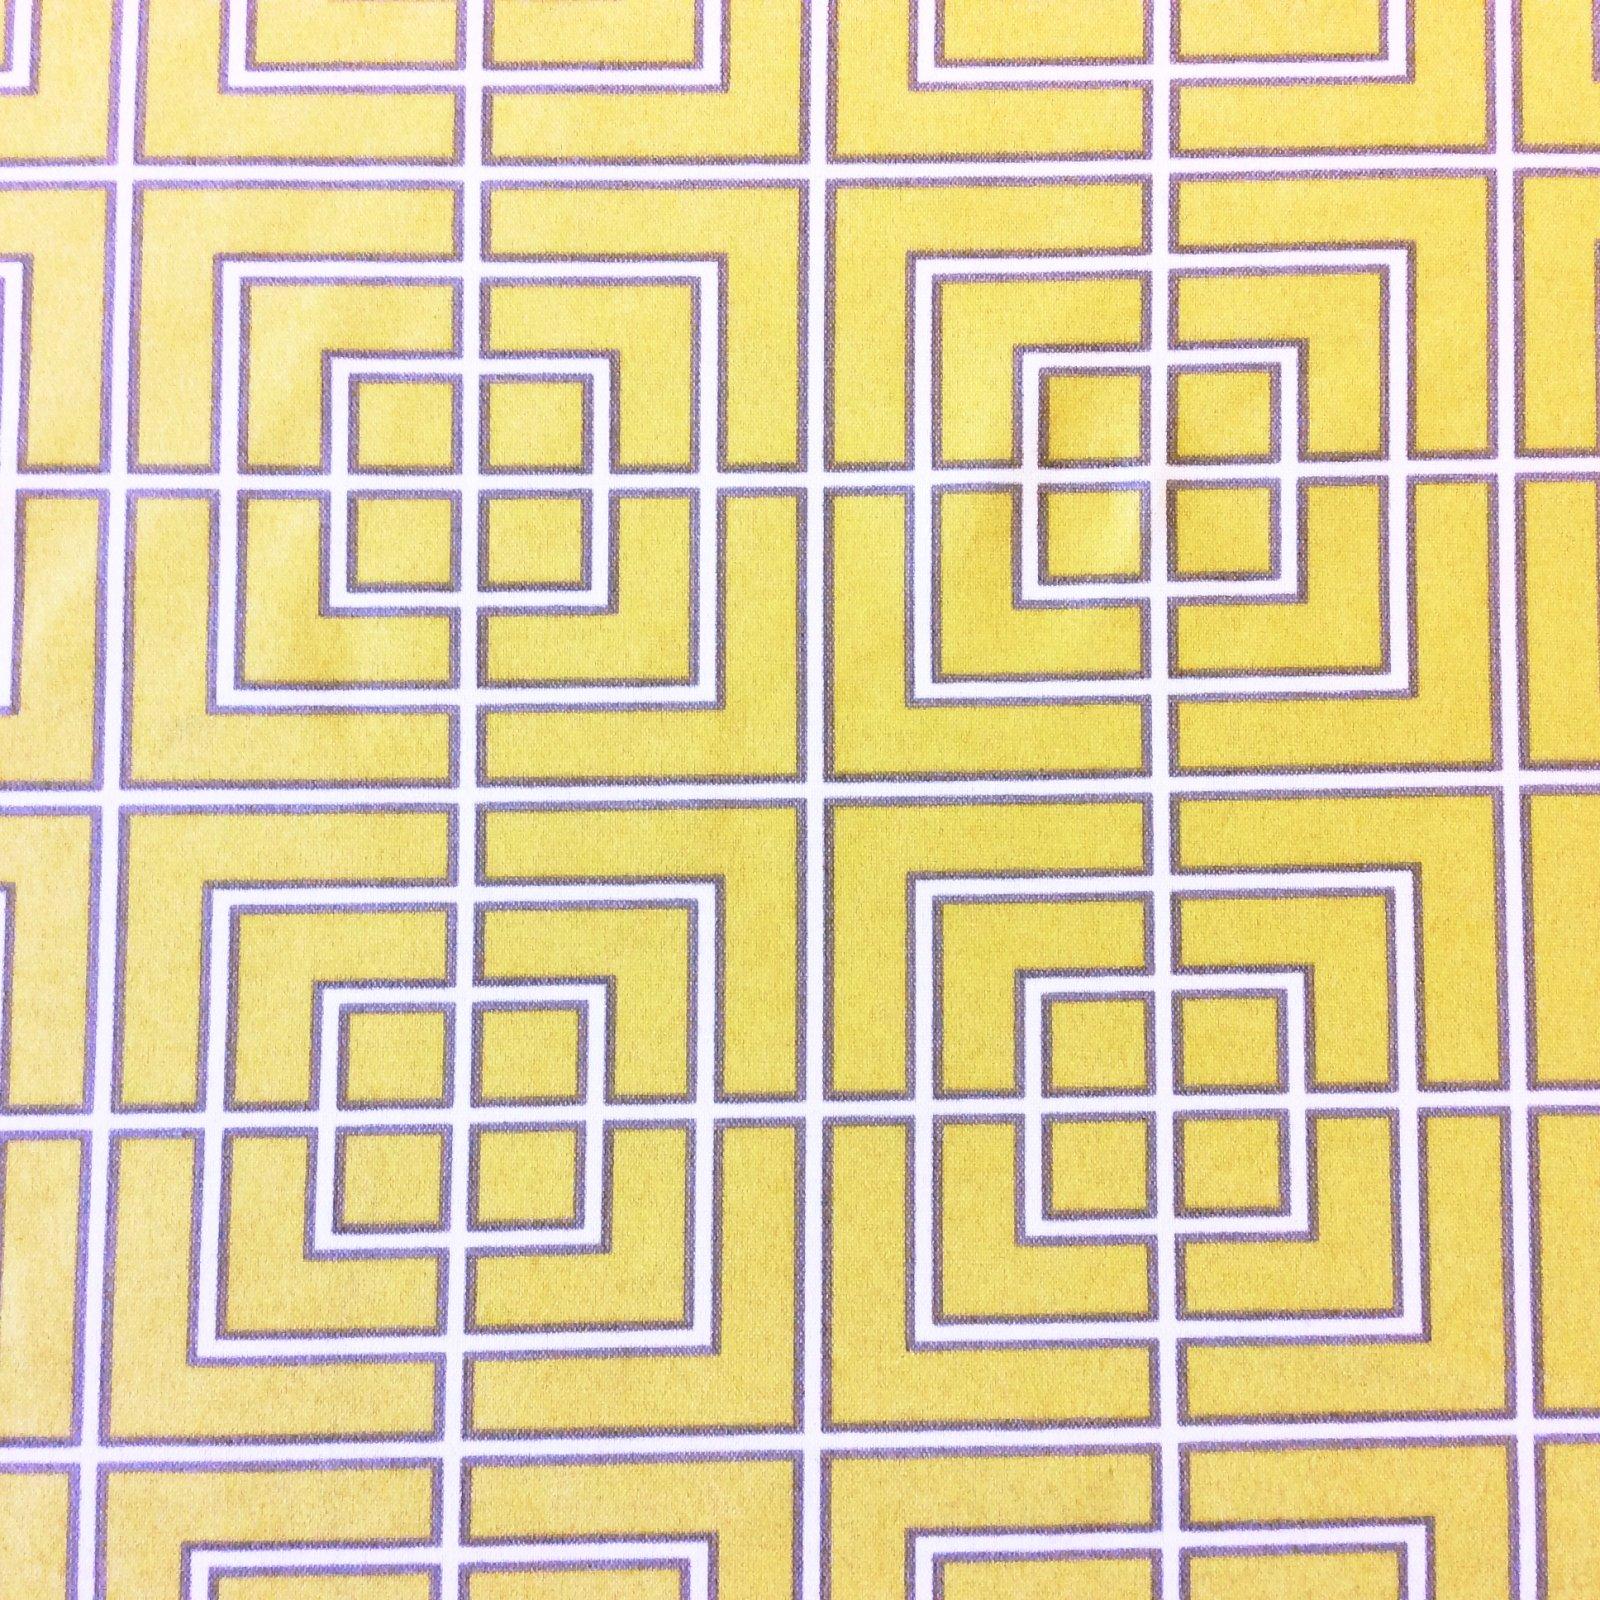 Geometric Yellow & White Geo Block Grid Square Patio Indoor Outdoor Home Dec Fabric SM25